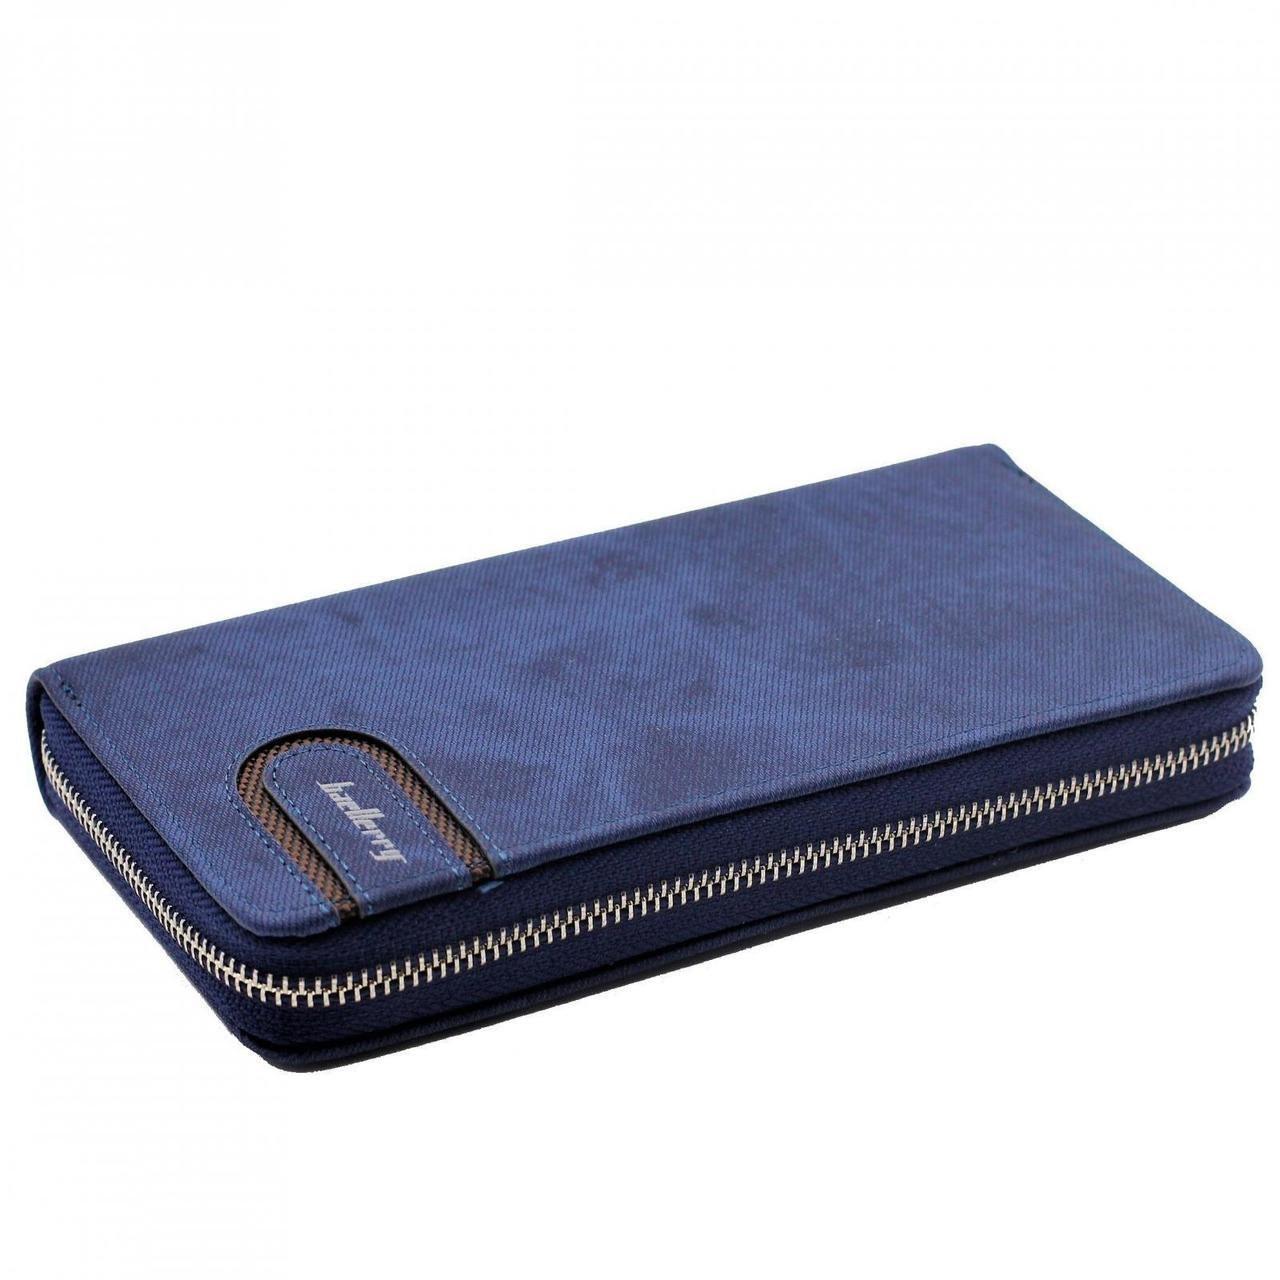 Мужской кошелек портмоне Baellerry S1514 blue, A420